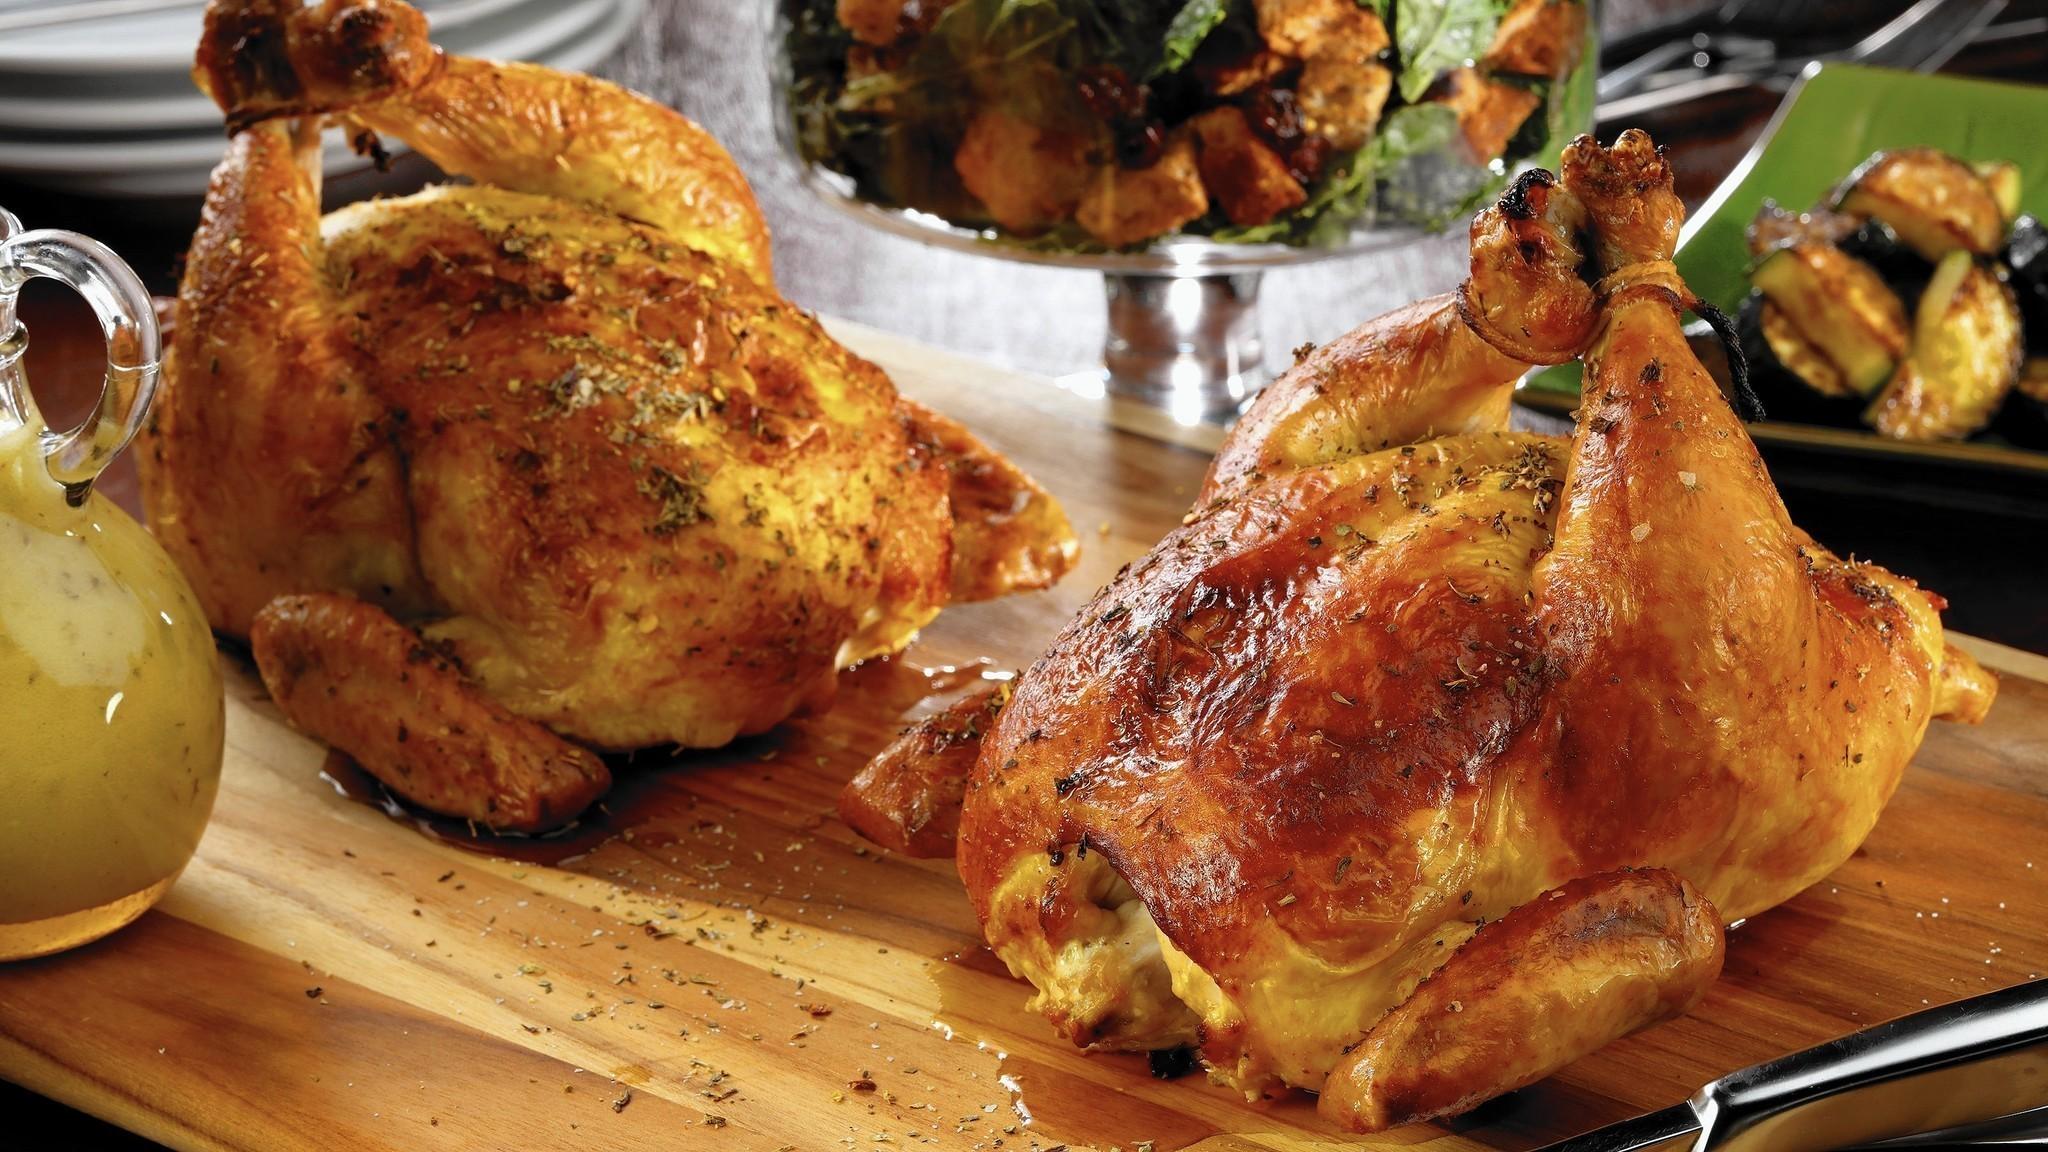 Go To Sure Fire Chicken Recipes That Deliver Big Flavor Chicago Tribune